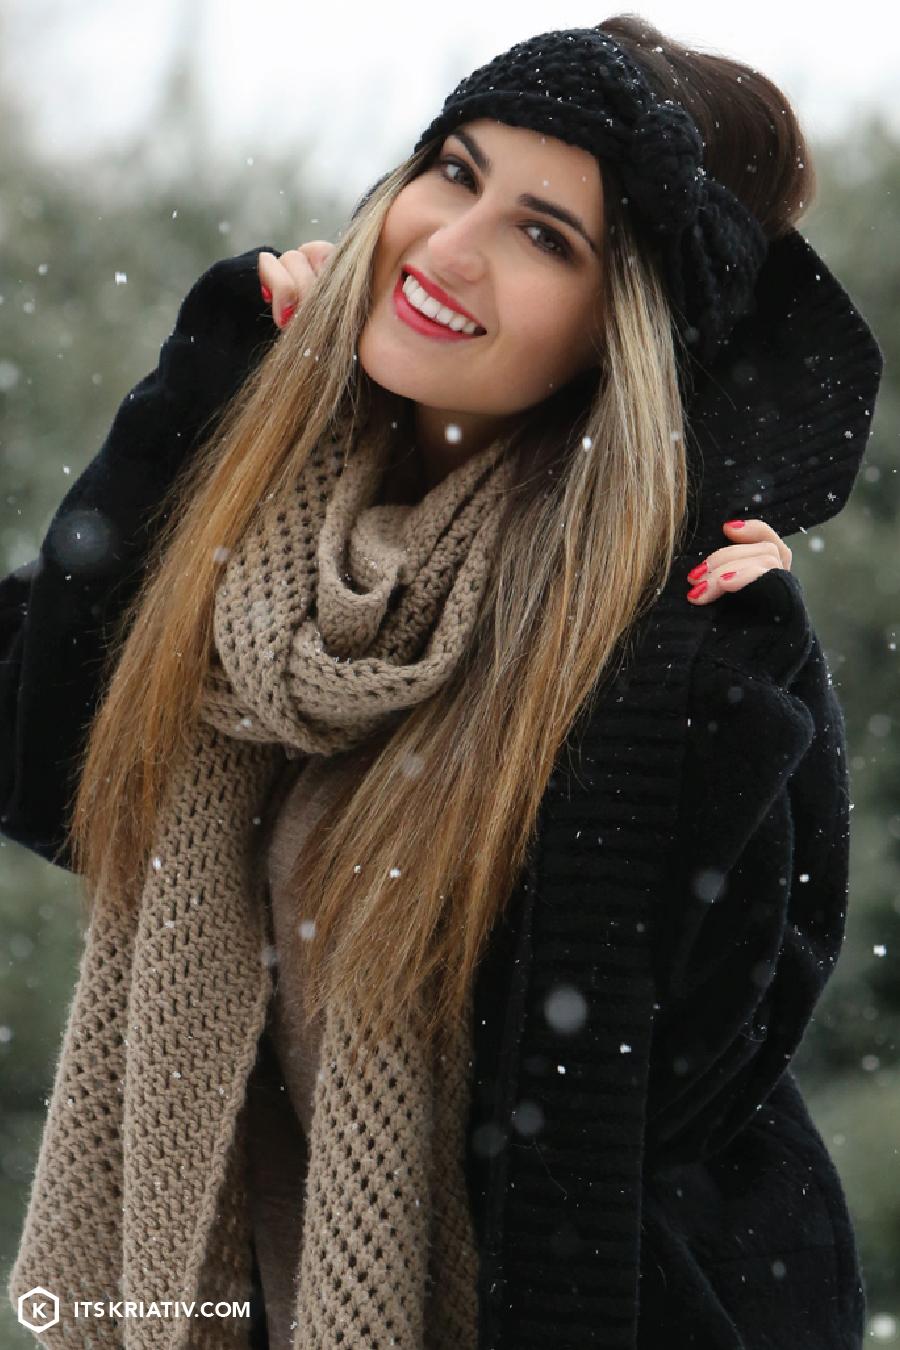 Its-Kriativ-Fashion-Let-It-Snow-Winter-06.jpg